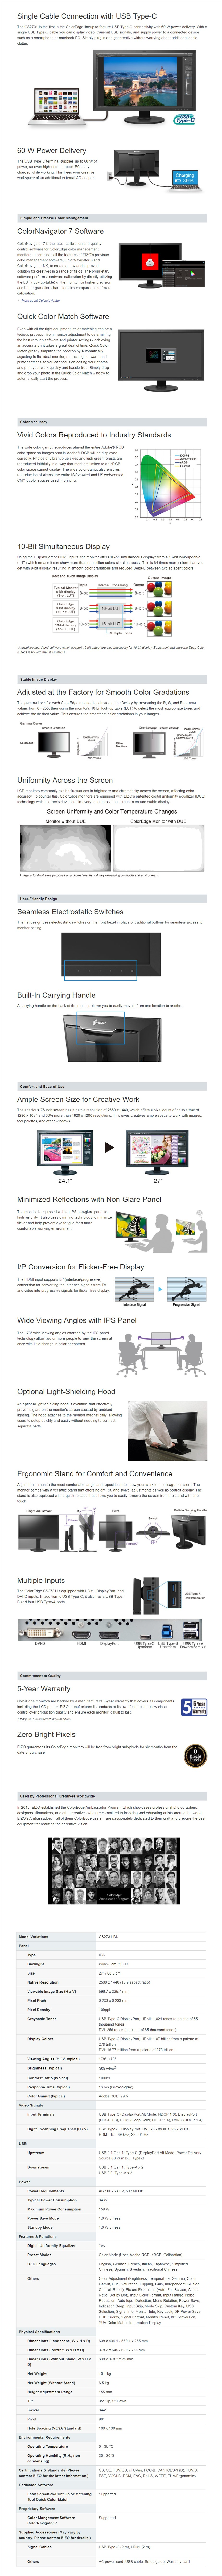 "EIZO ColorEdge CS2731 27"" QHD 99% Adobe RGB Calibrated IPS Designer Monitor - Overview 1"